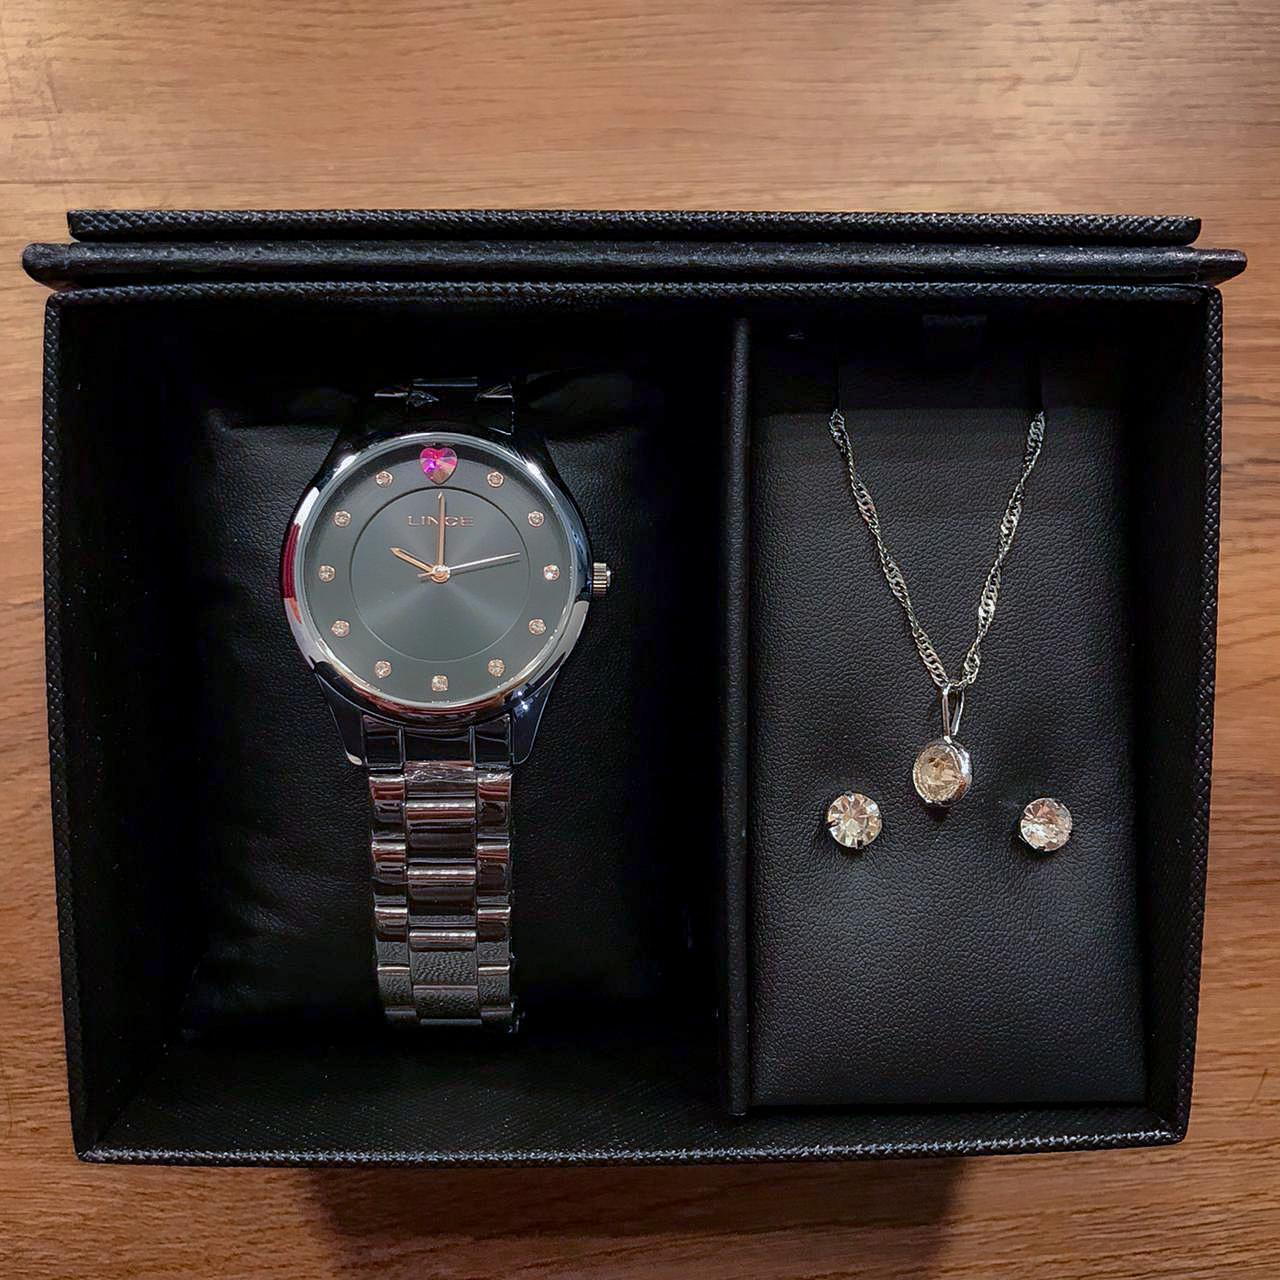 Kit Relógio Lince Prata e Preto - LRMJ138L